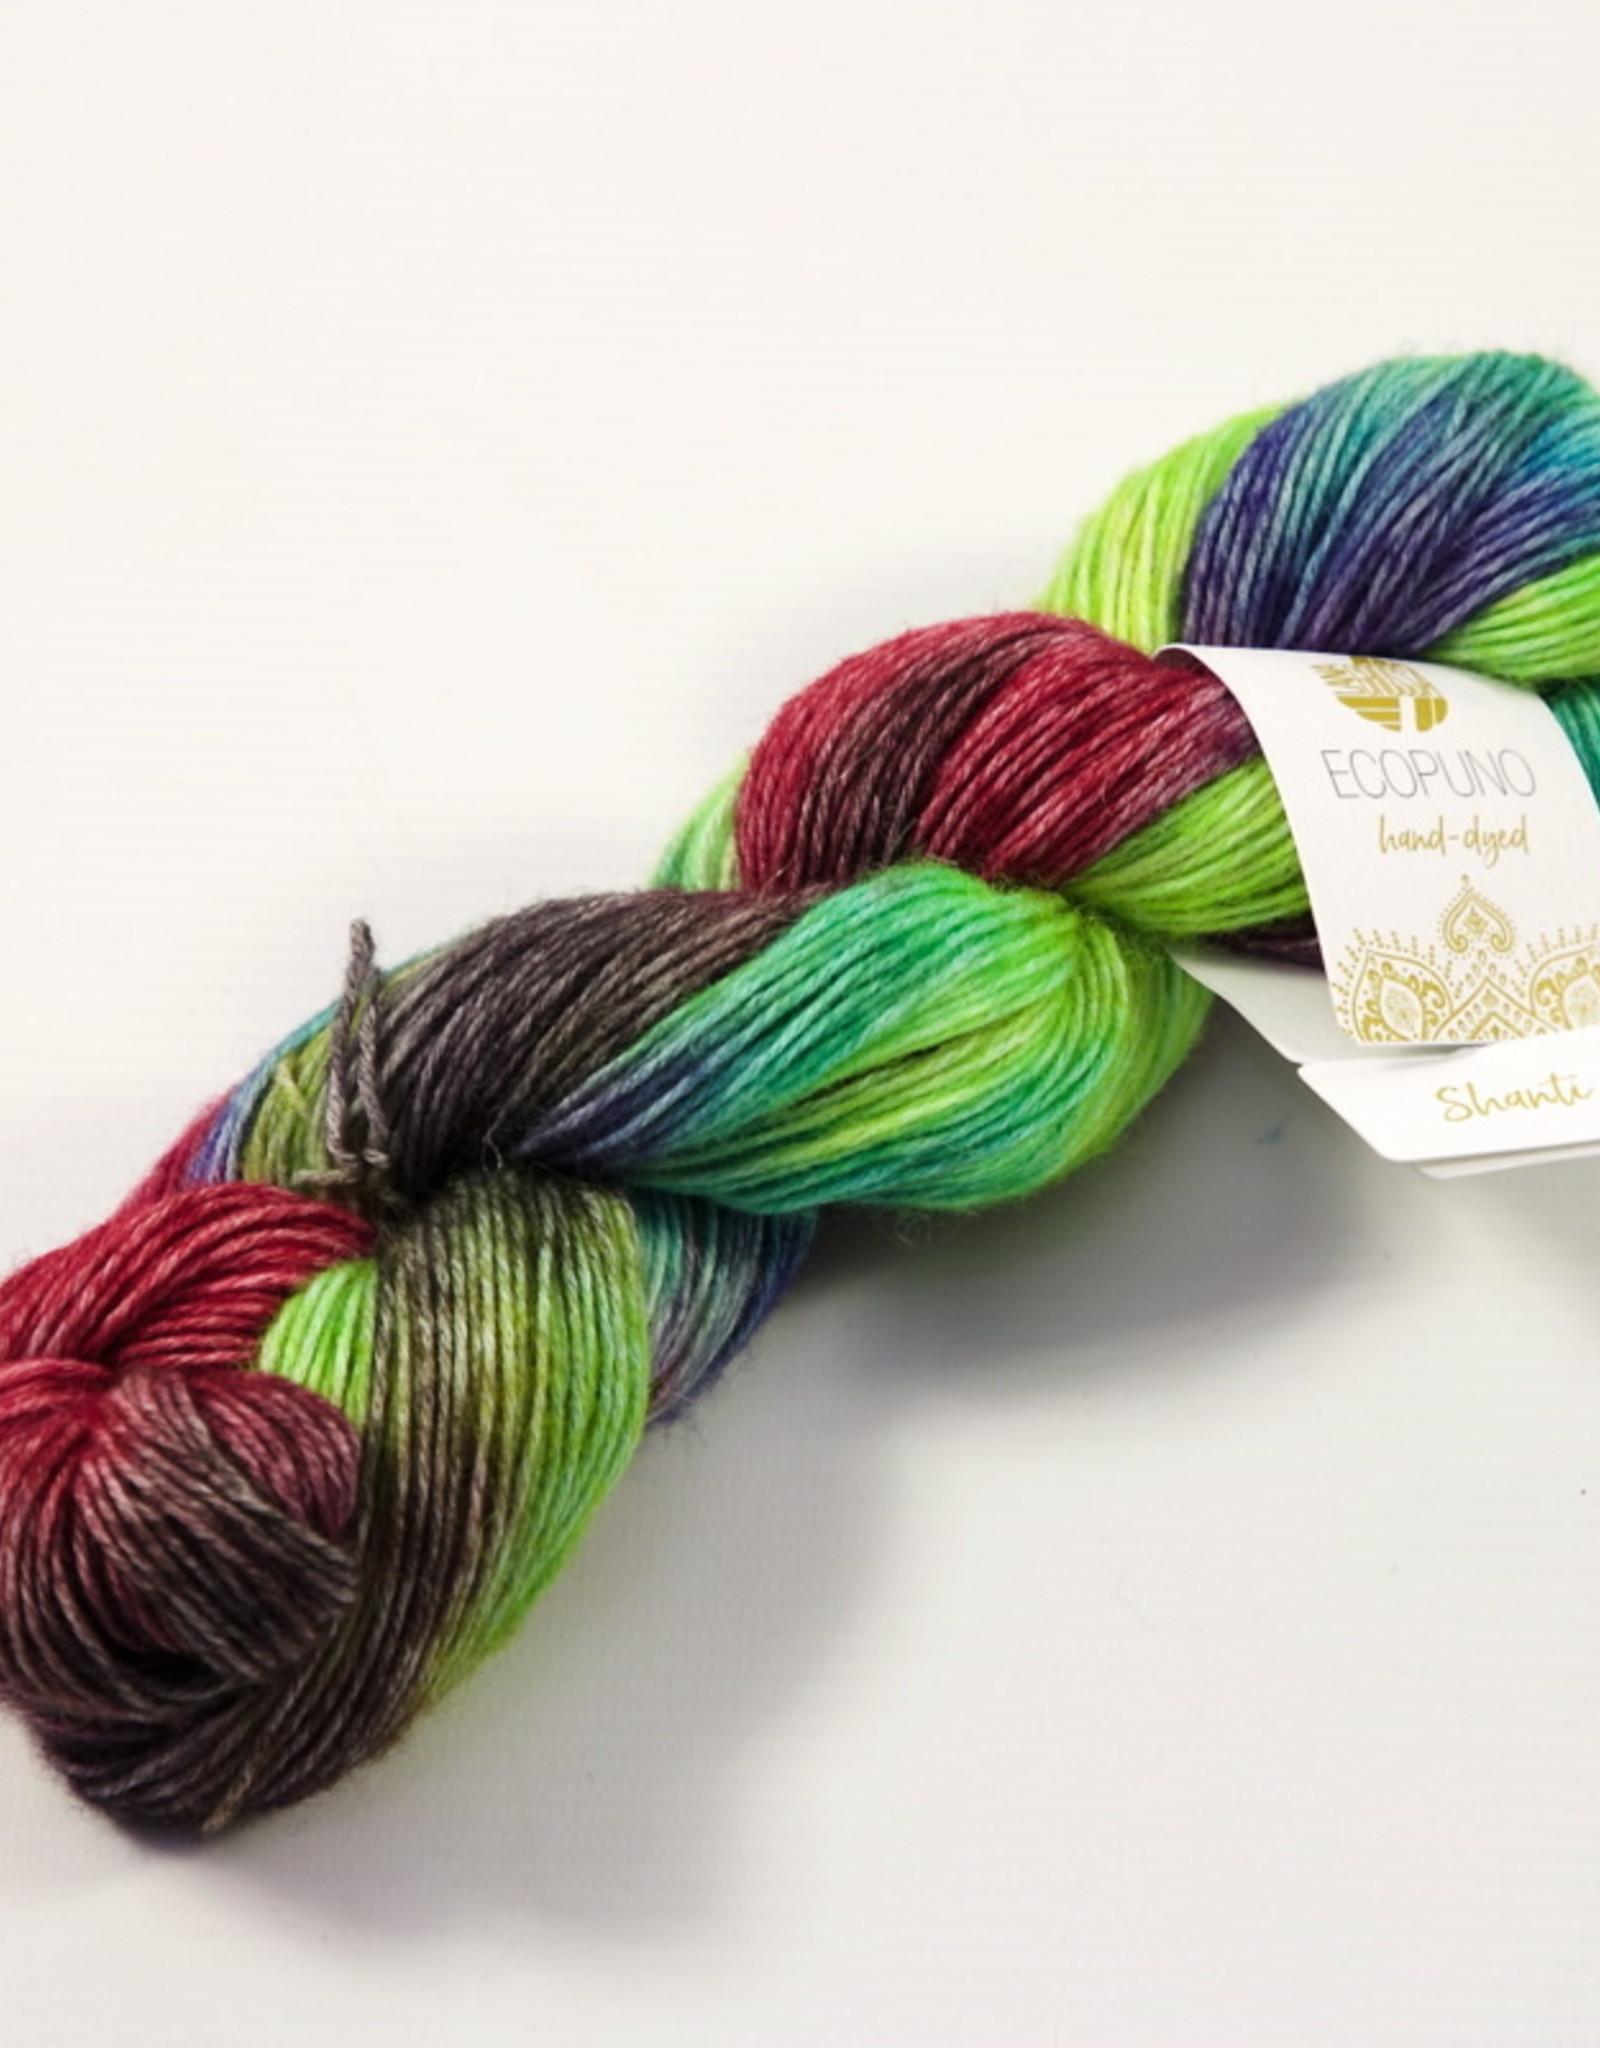 Lana Grossa Ecopuno Hand-Dyed 502